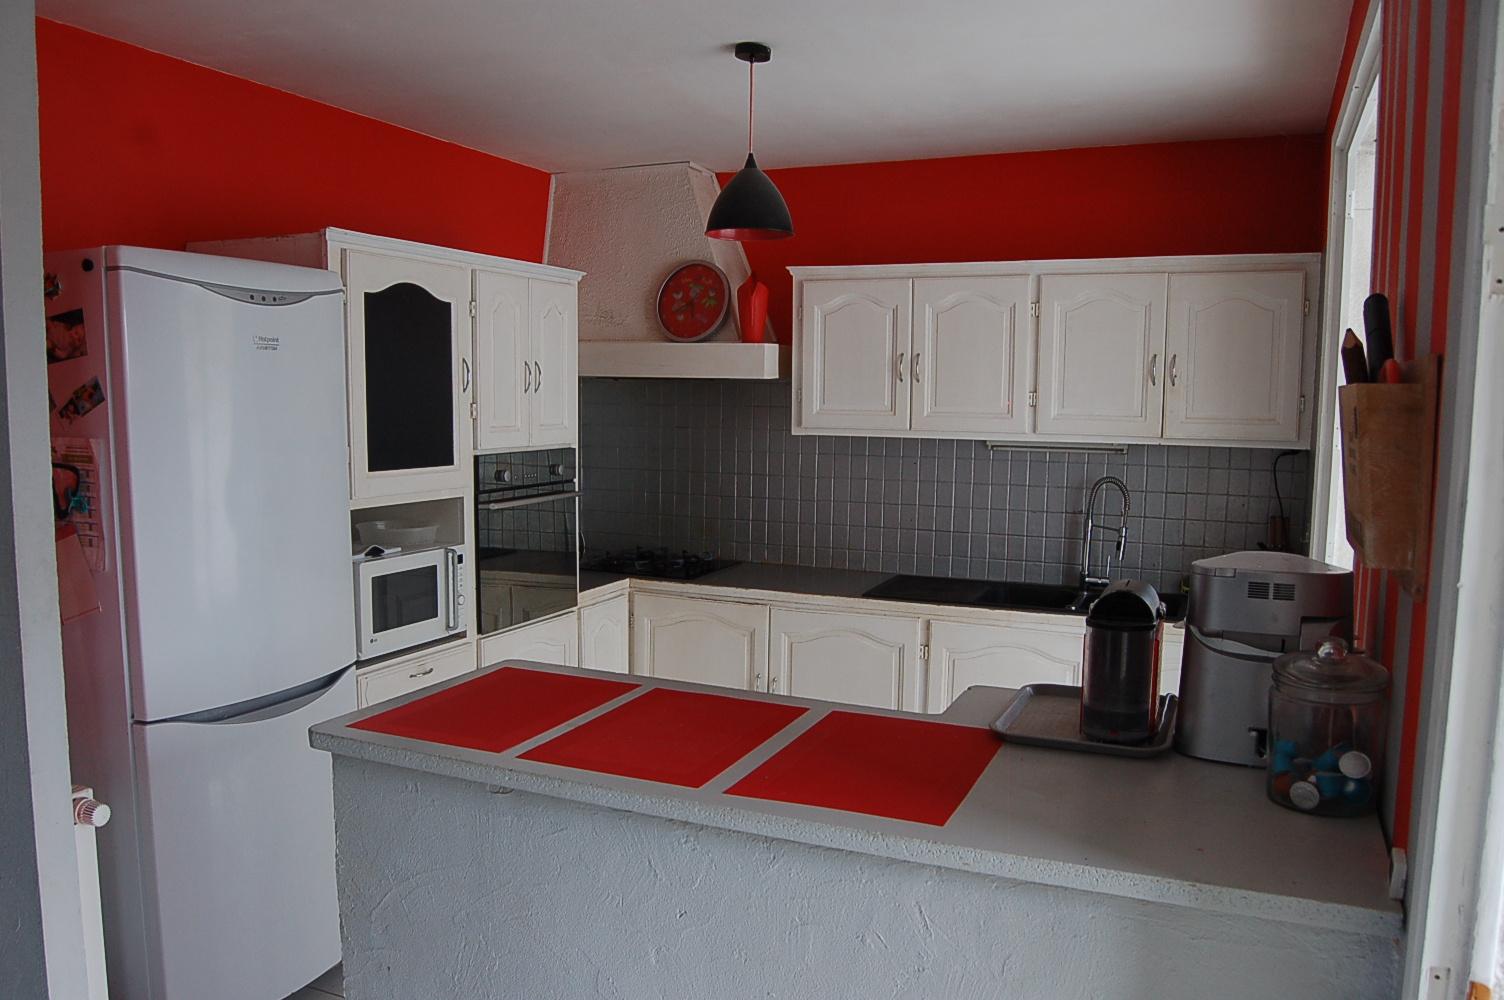 Vente maison/villa lamarche sur saone